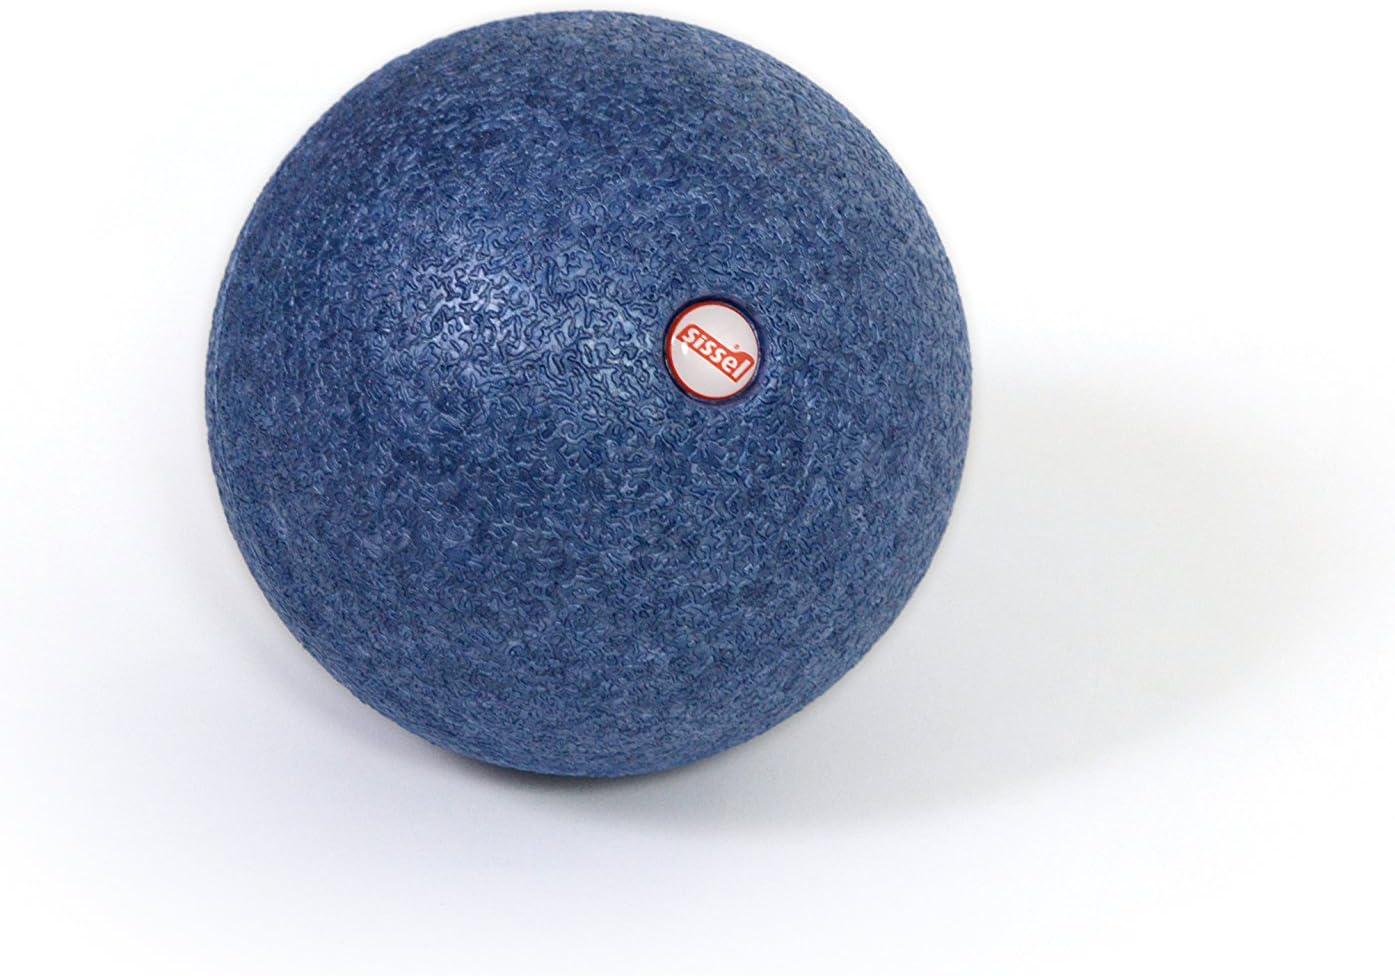 Sissel Uni myof ascia CA Fascia Pelota, Azul, diámetro 12 cm ...